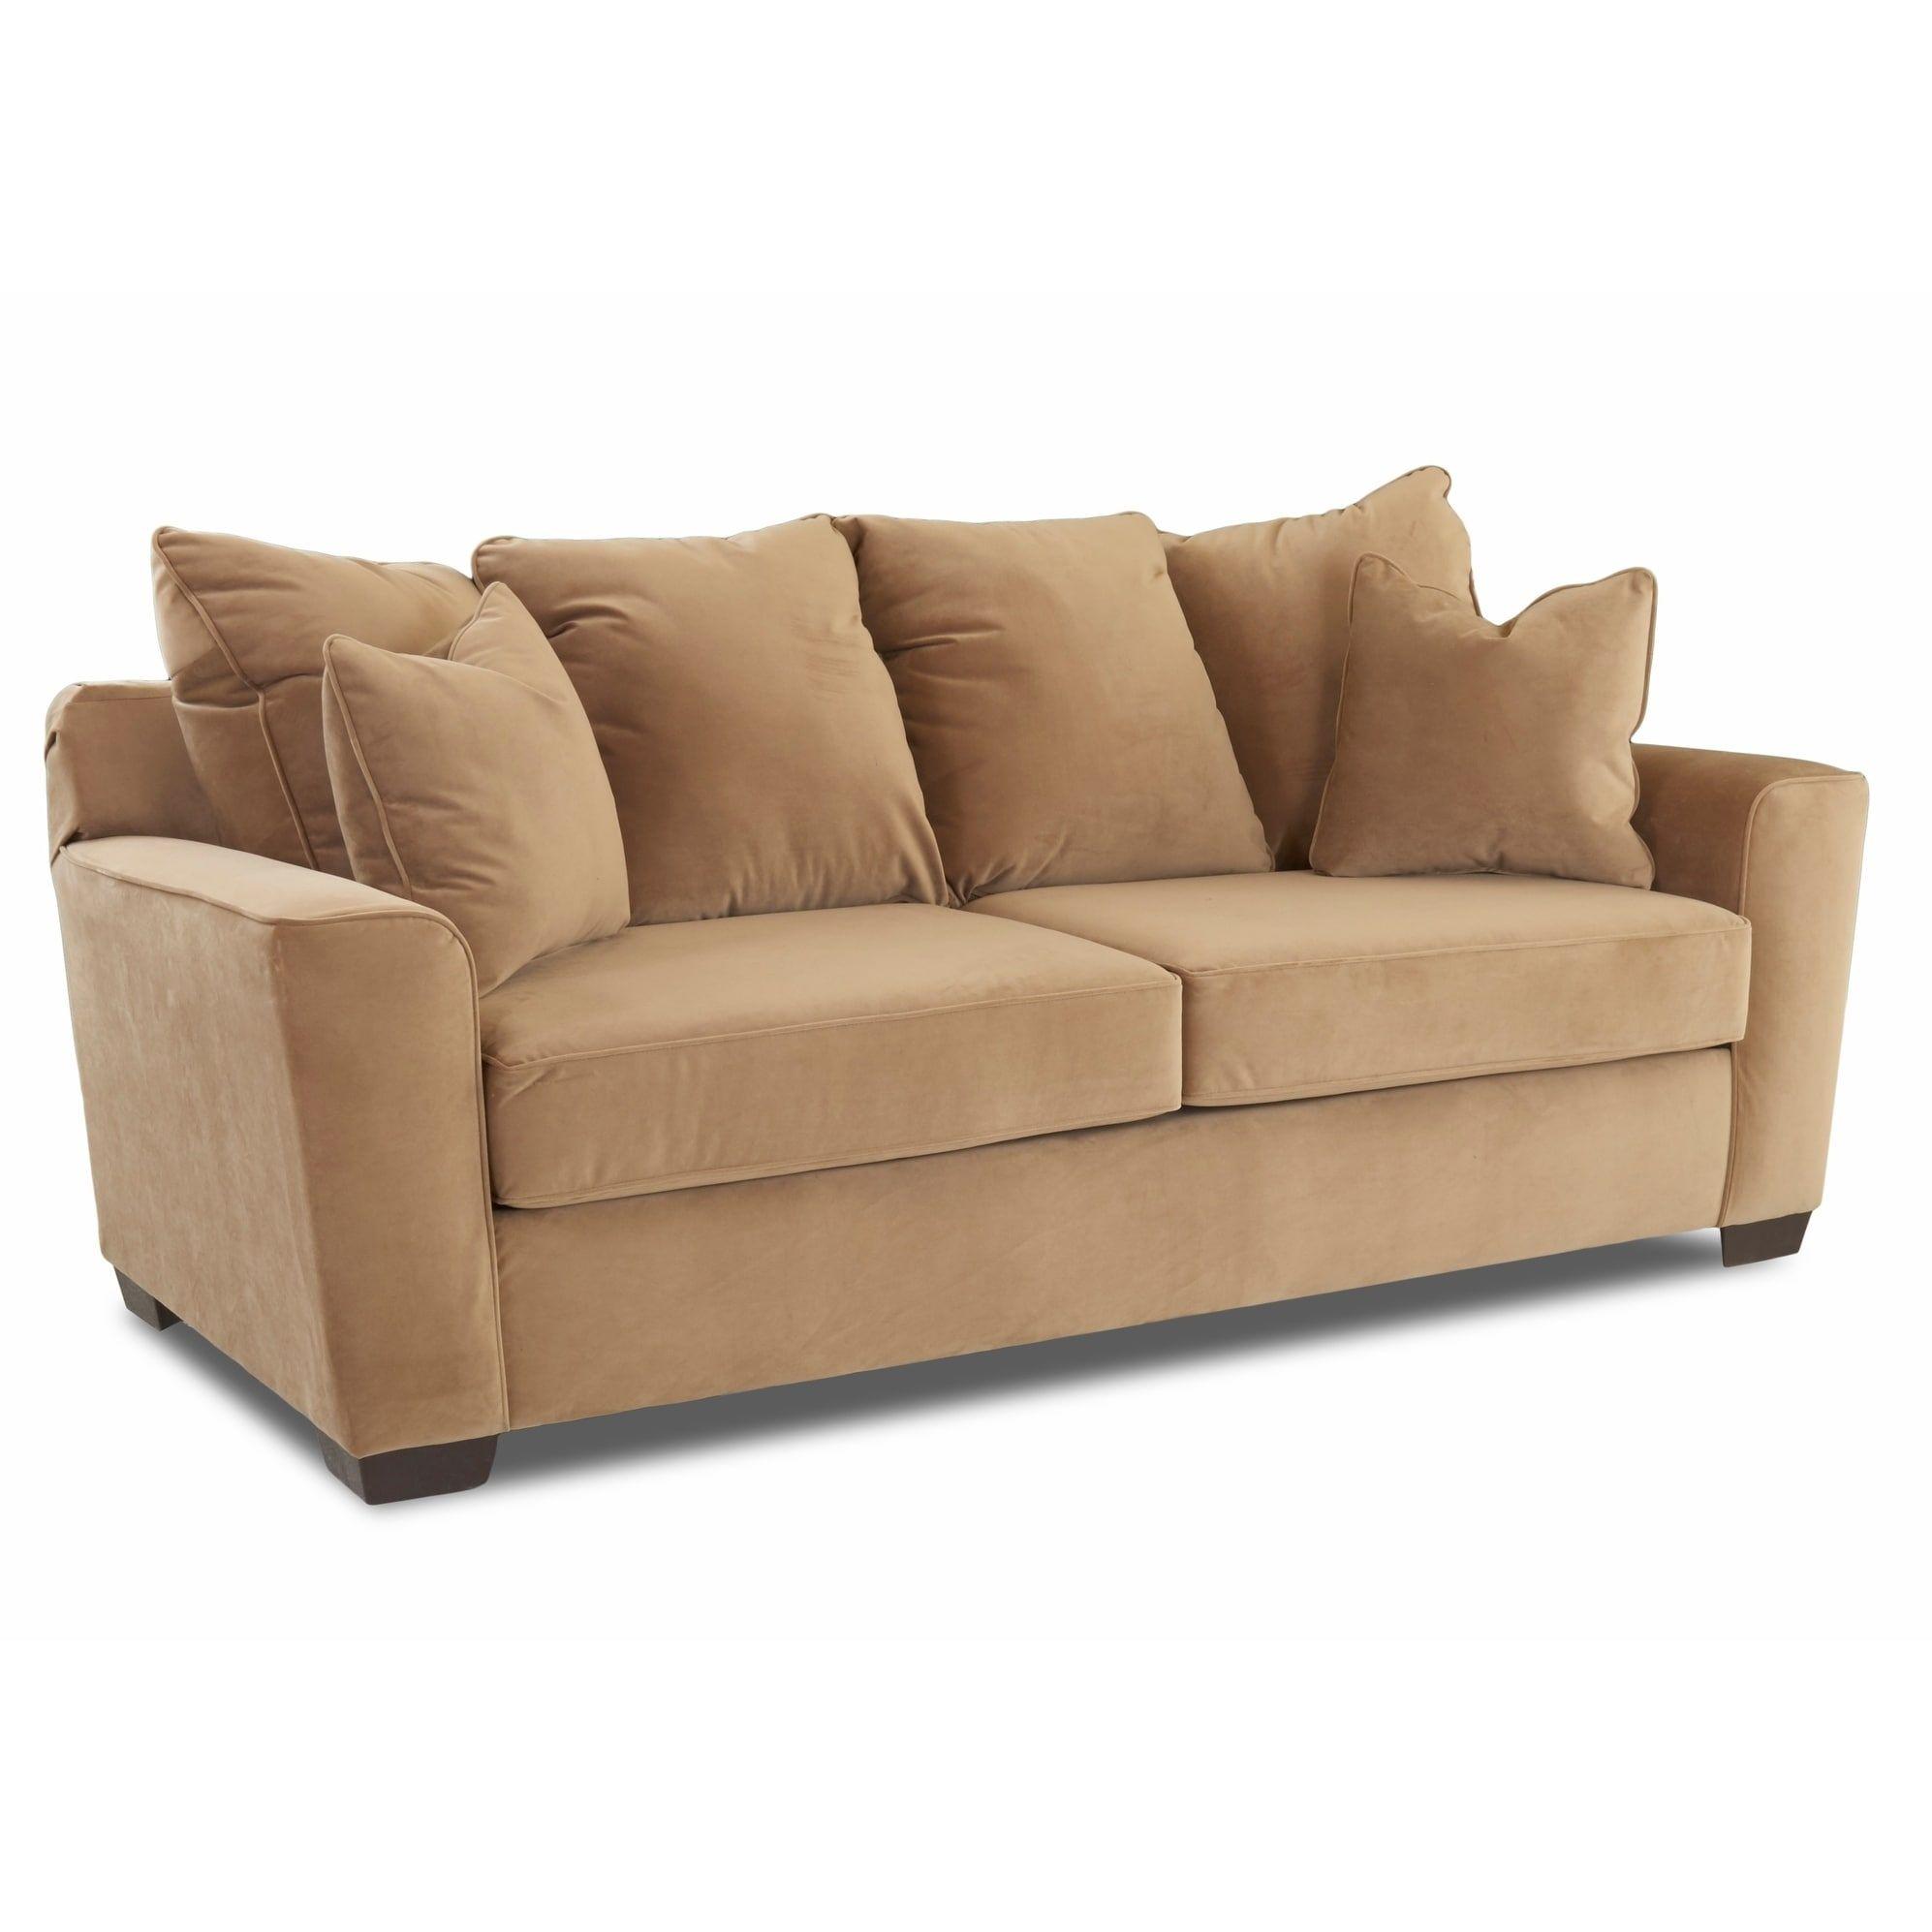 Klaussner Furniture Heather Microfiber Sofa (Coffee), Tan (Polyester)